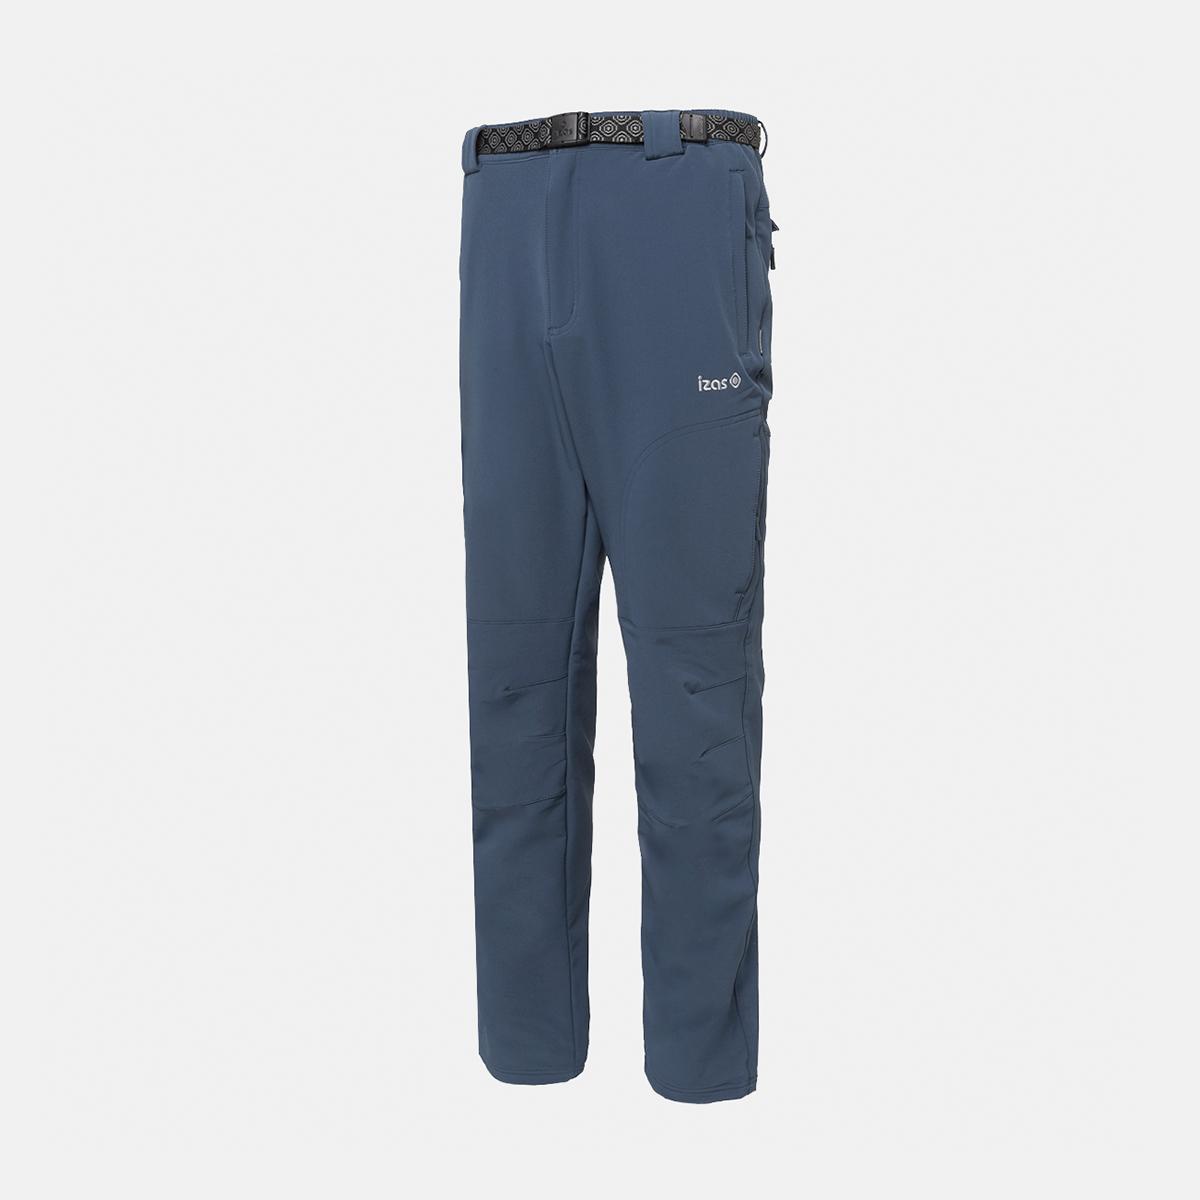 MAN'S CHAMONIX STRETCH PANT BLUE